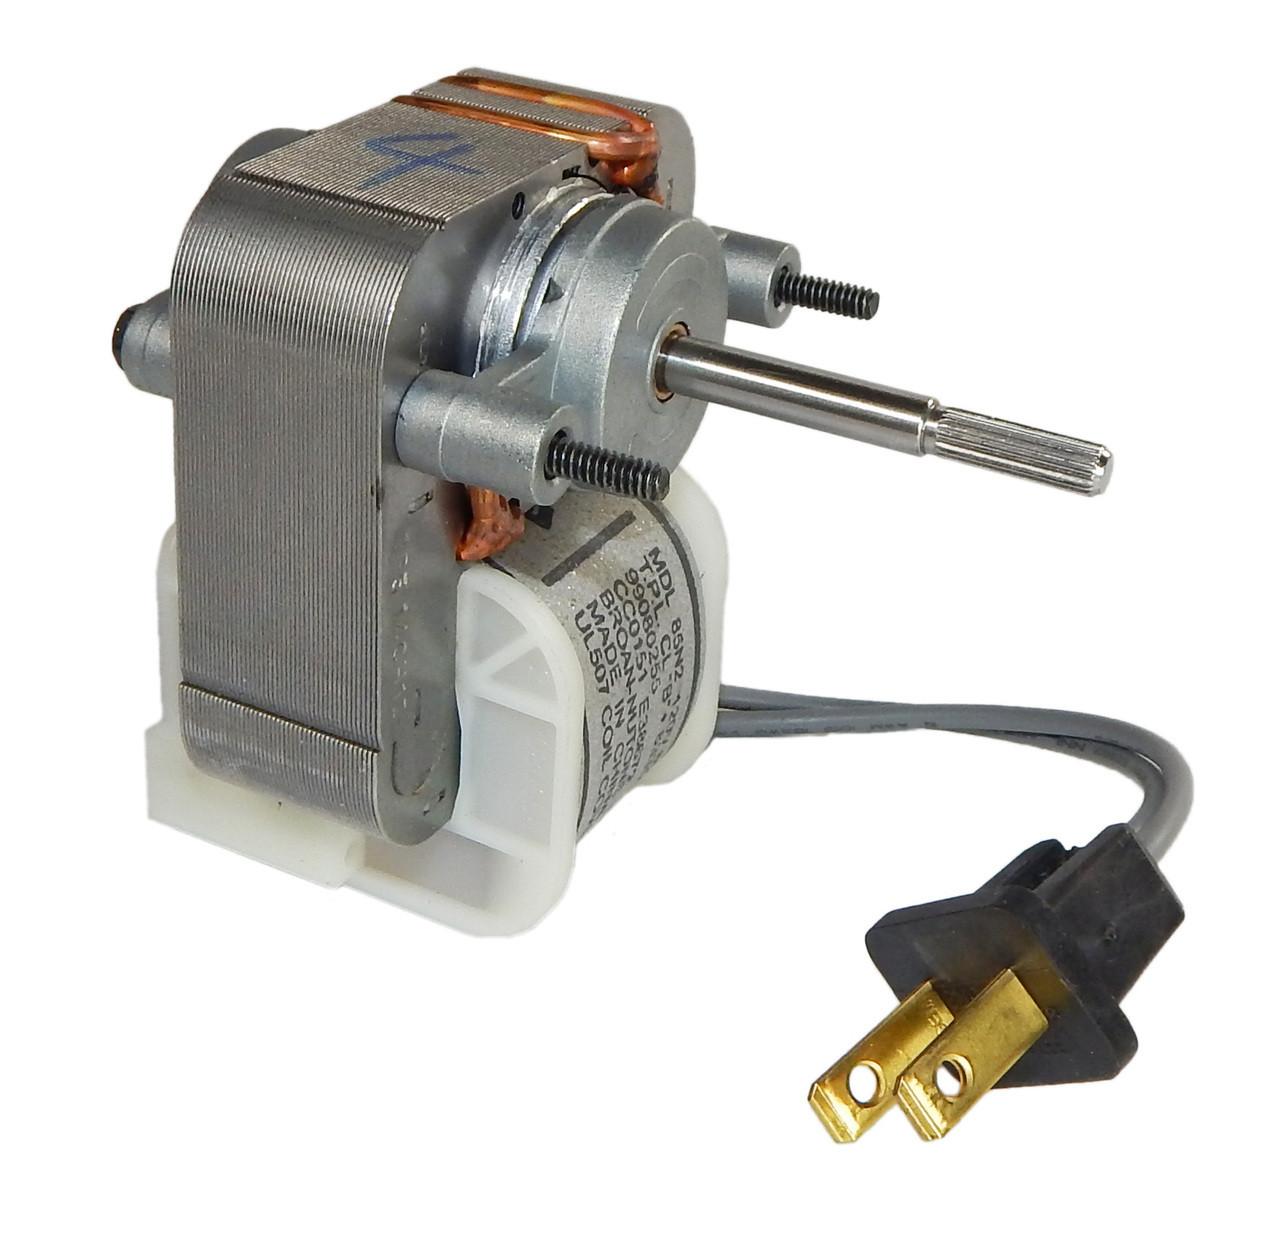 Image 1. Broan 671 Replacement Bath Fan Motor   99080255  1 5 amps  1500